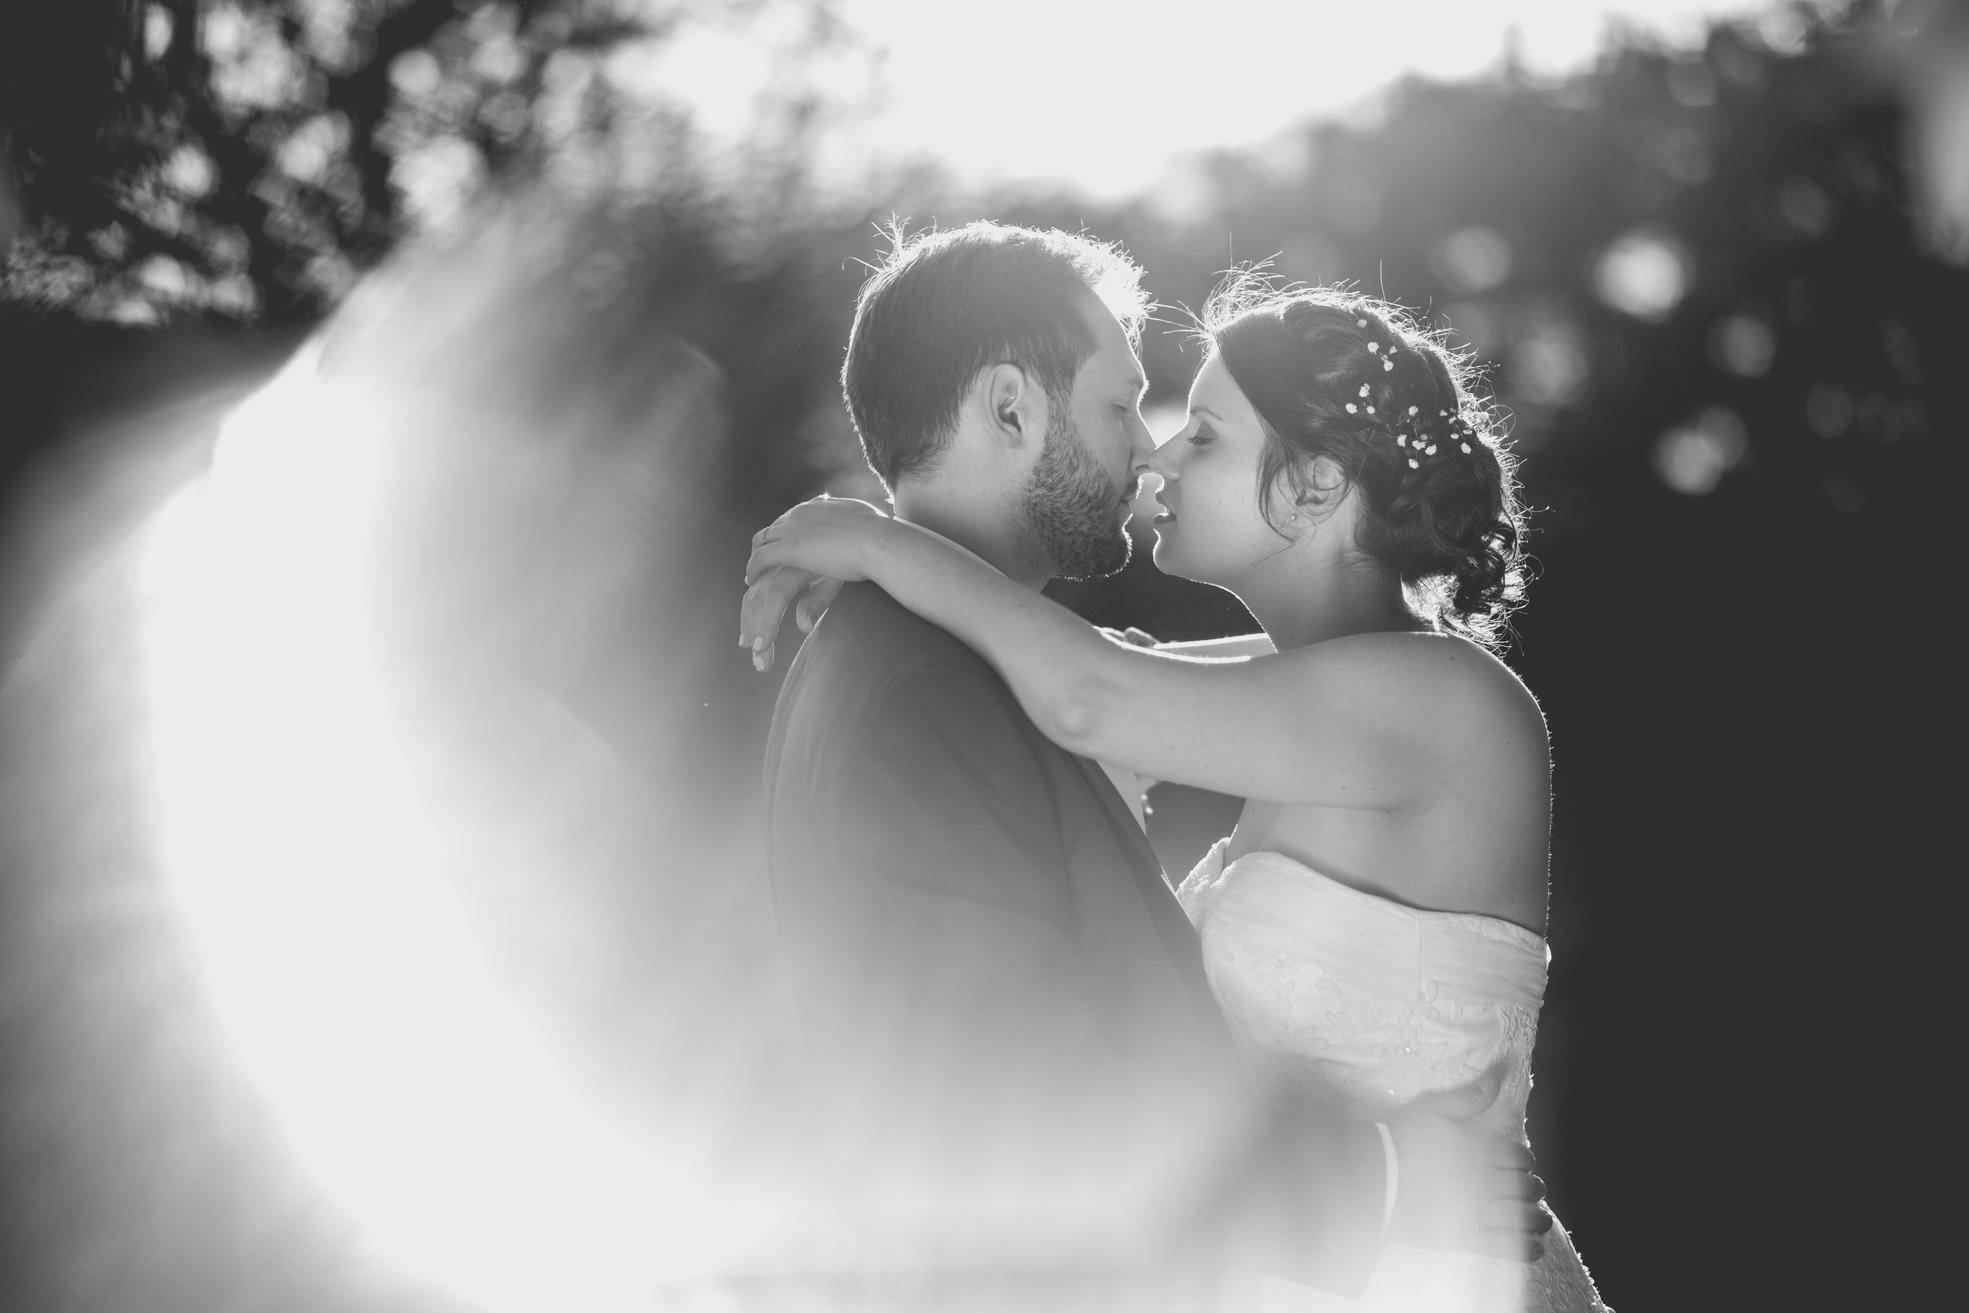 photographe mariage ile de france, photographe mariage IDF, photographe mariage 78, meilleur photographe mariage, jean-Baptiste Chauvin